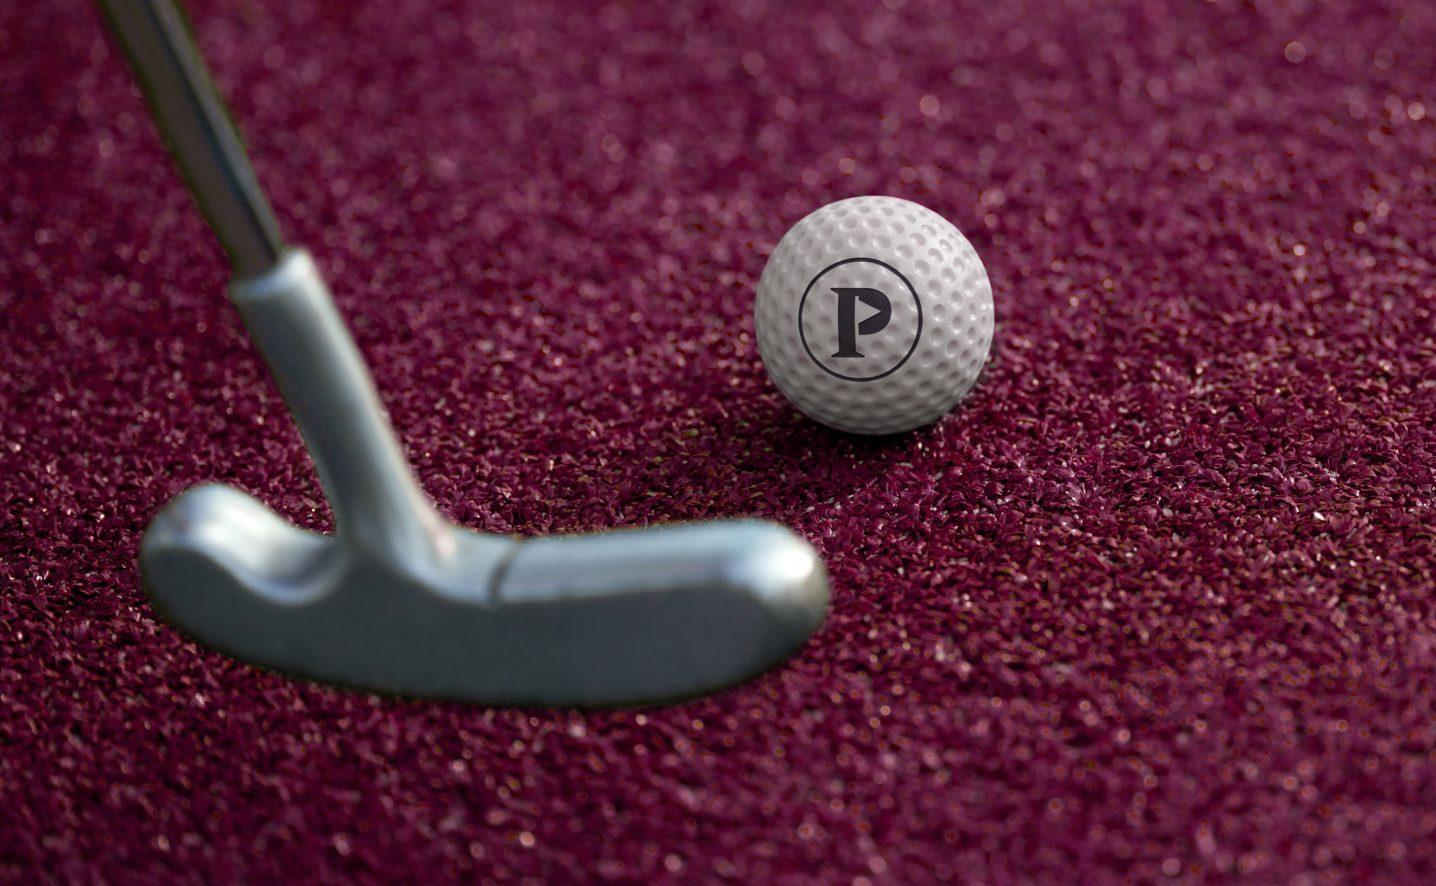 puttshack-branded-minigolf-ball